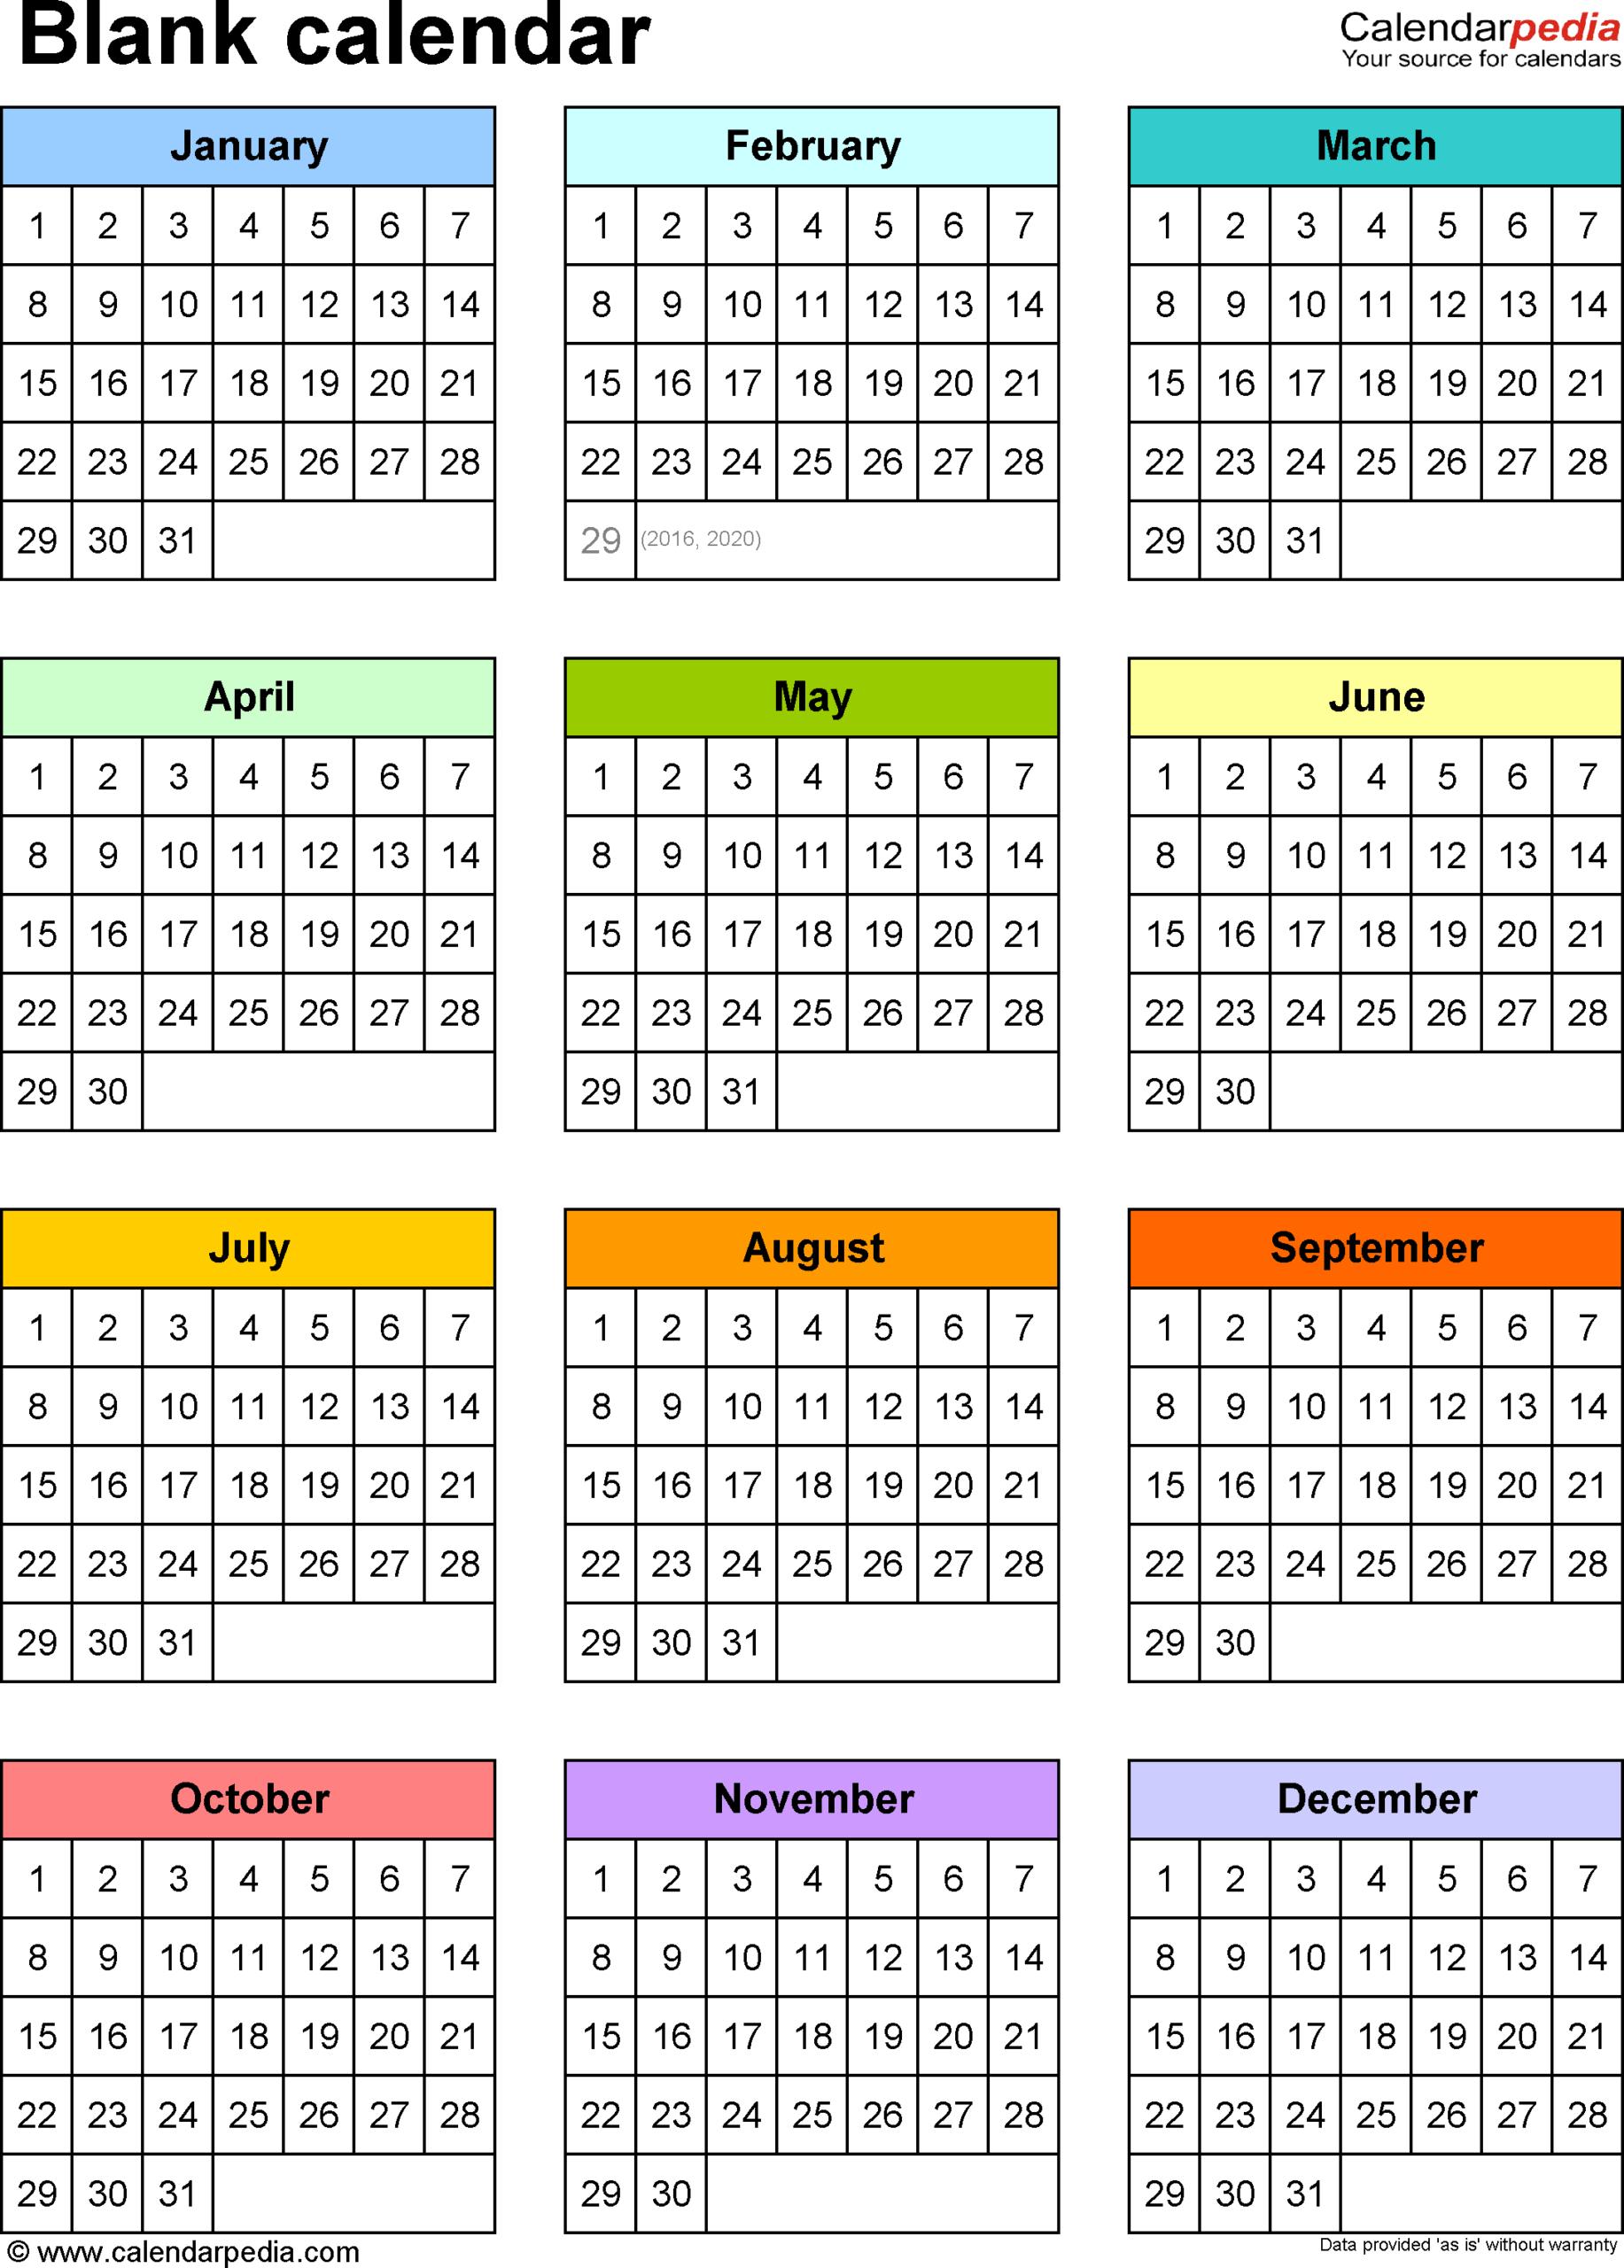 Blank Calendars - Free Printable Microsoft Word Templates inside Month At A Glance Blank Calendar Template